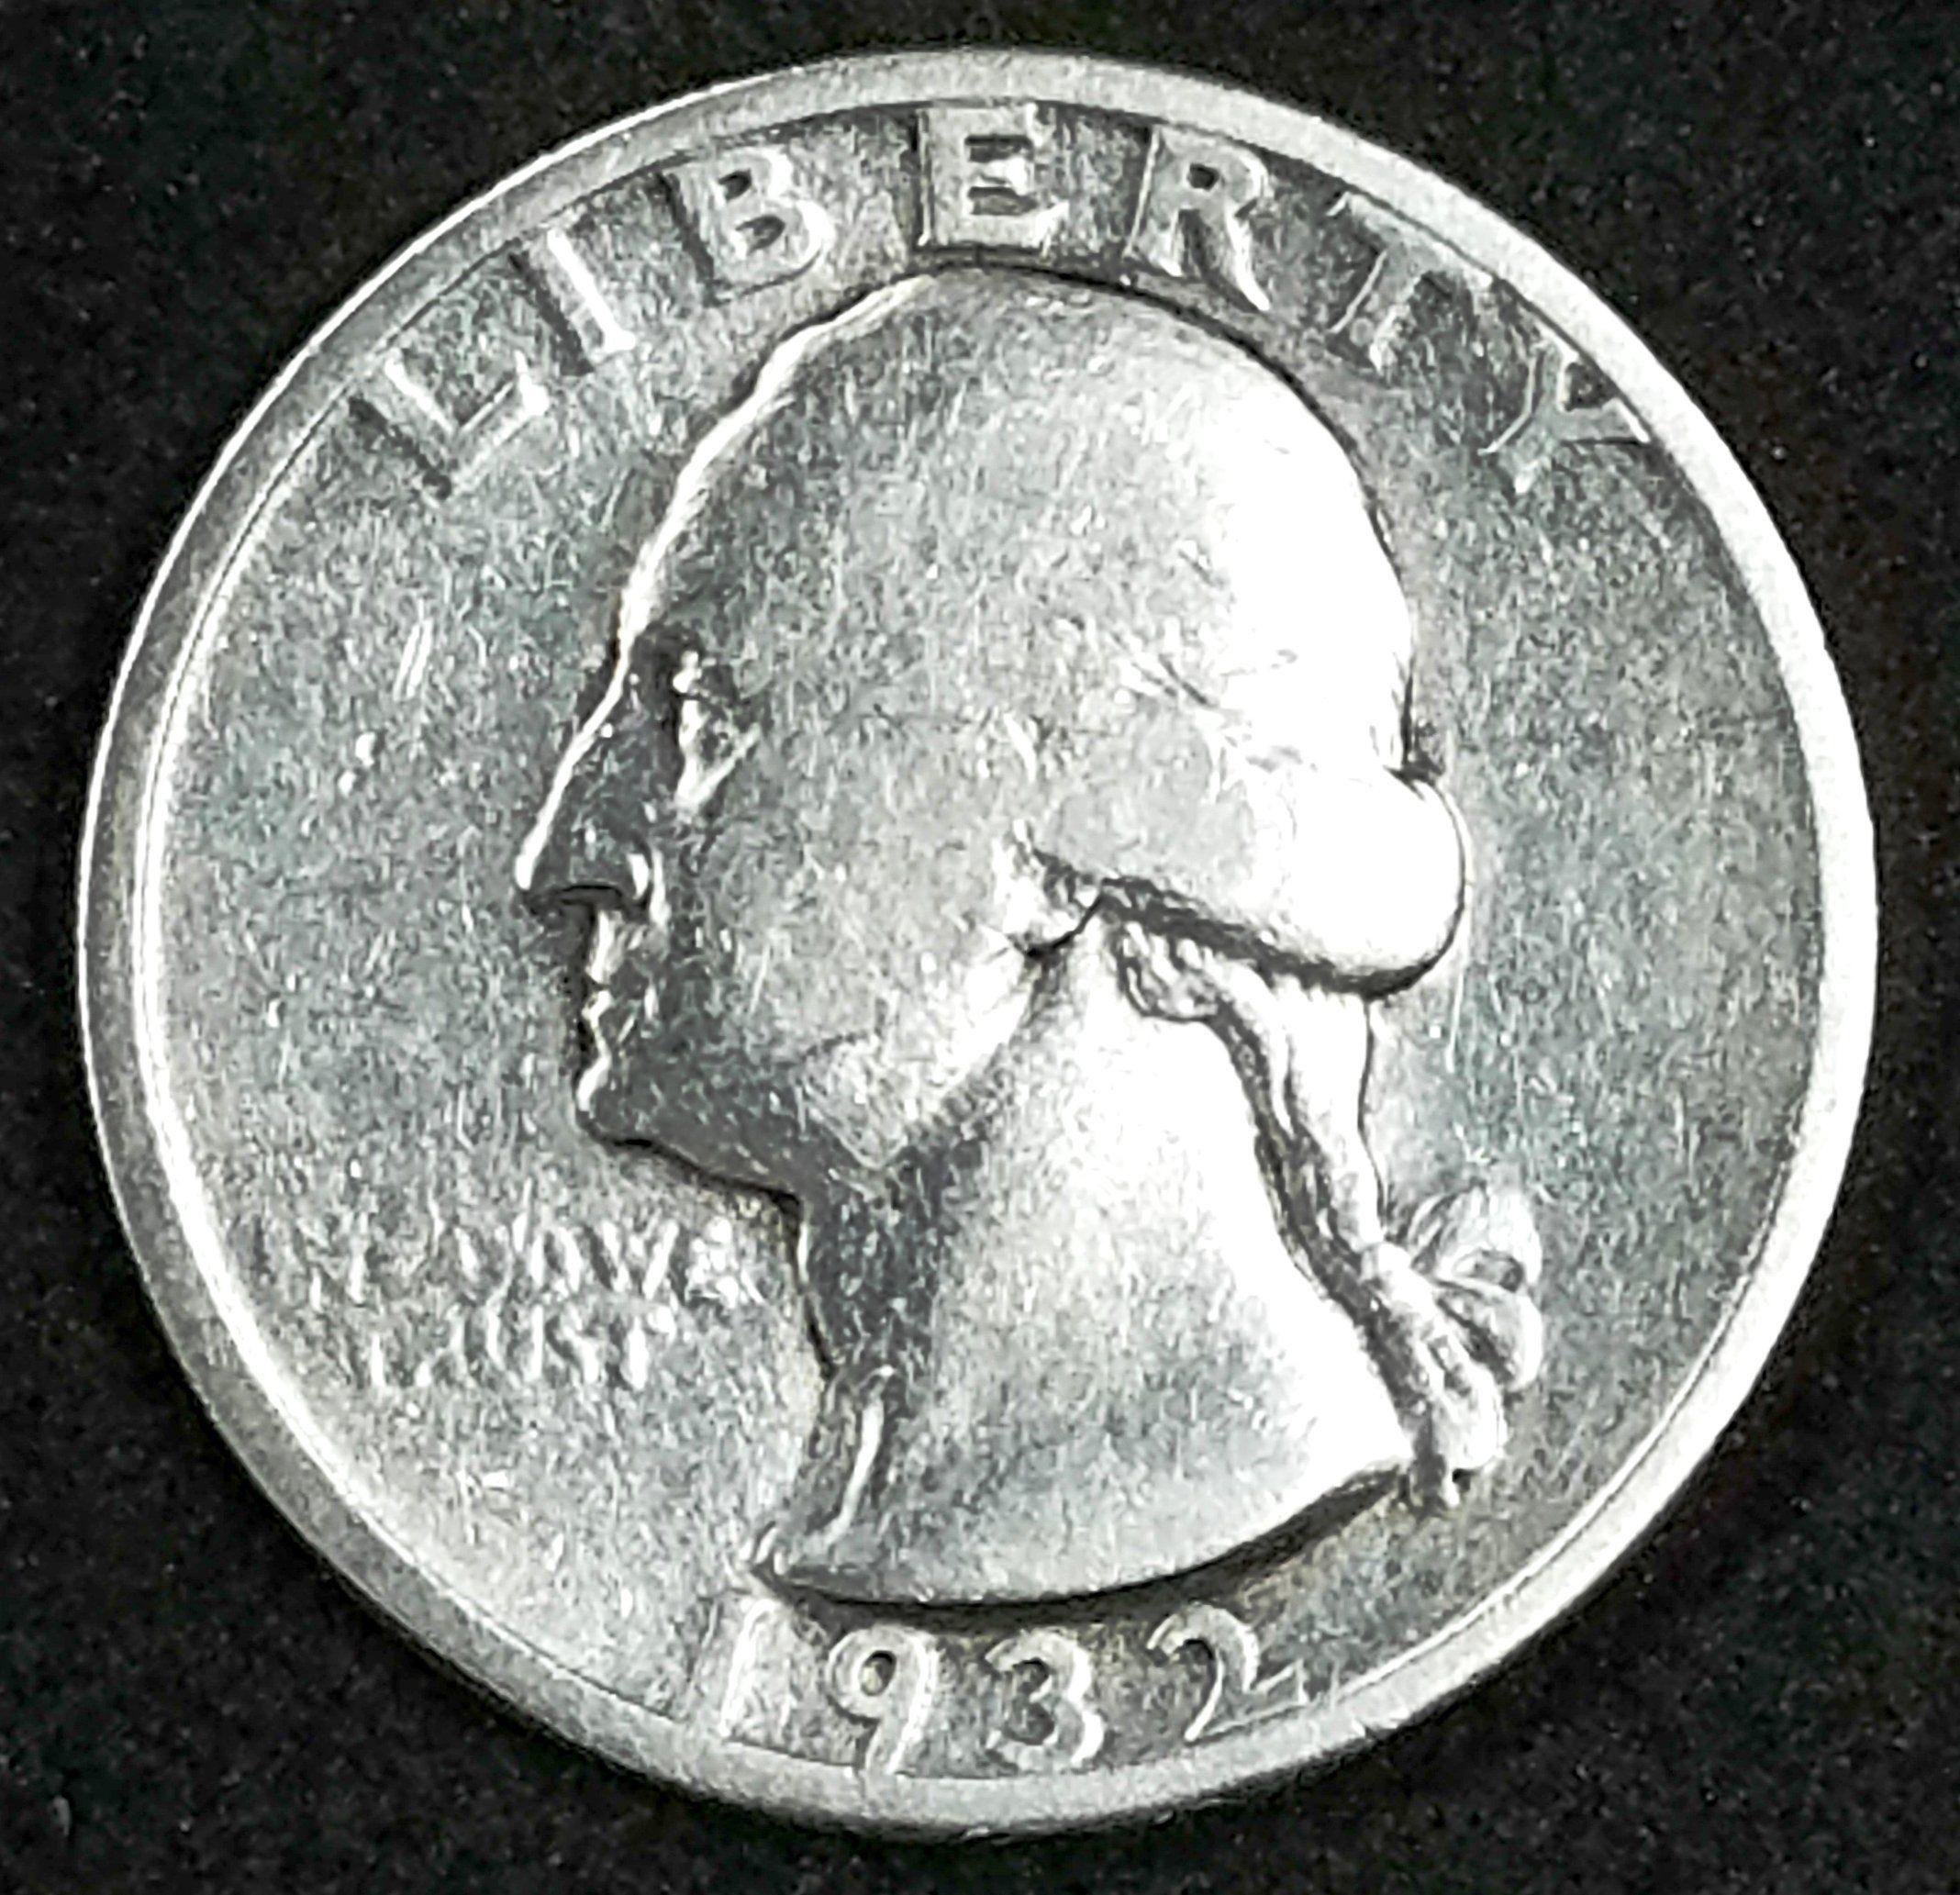 1918 S Lincoln Wheat Cent Lamination Error Error Coins Valuable Coins Coins